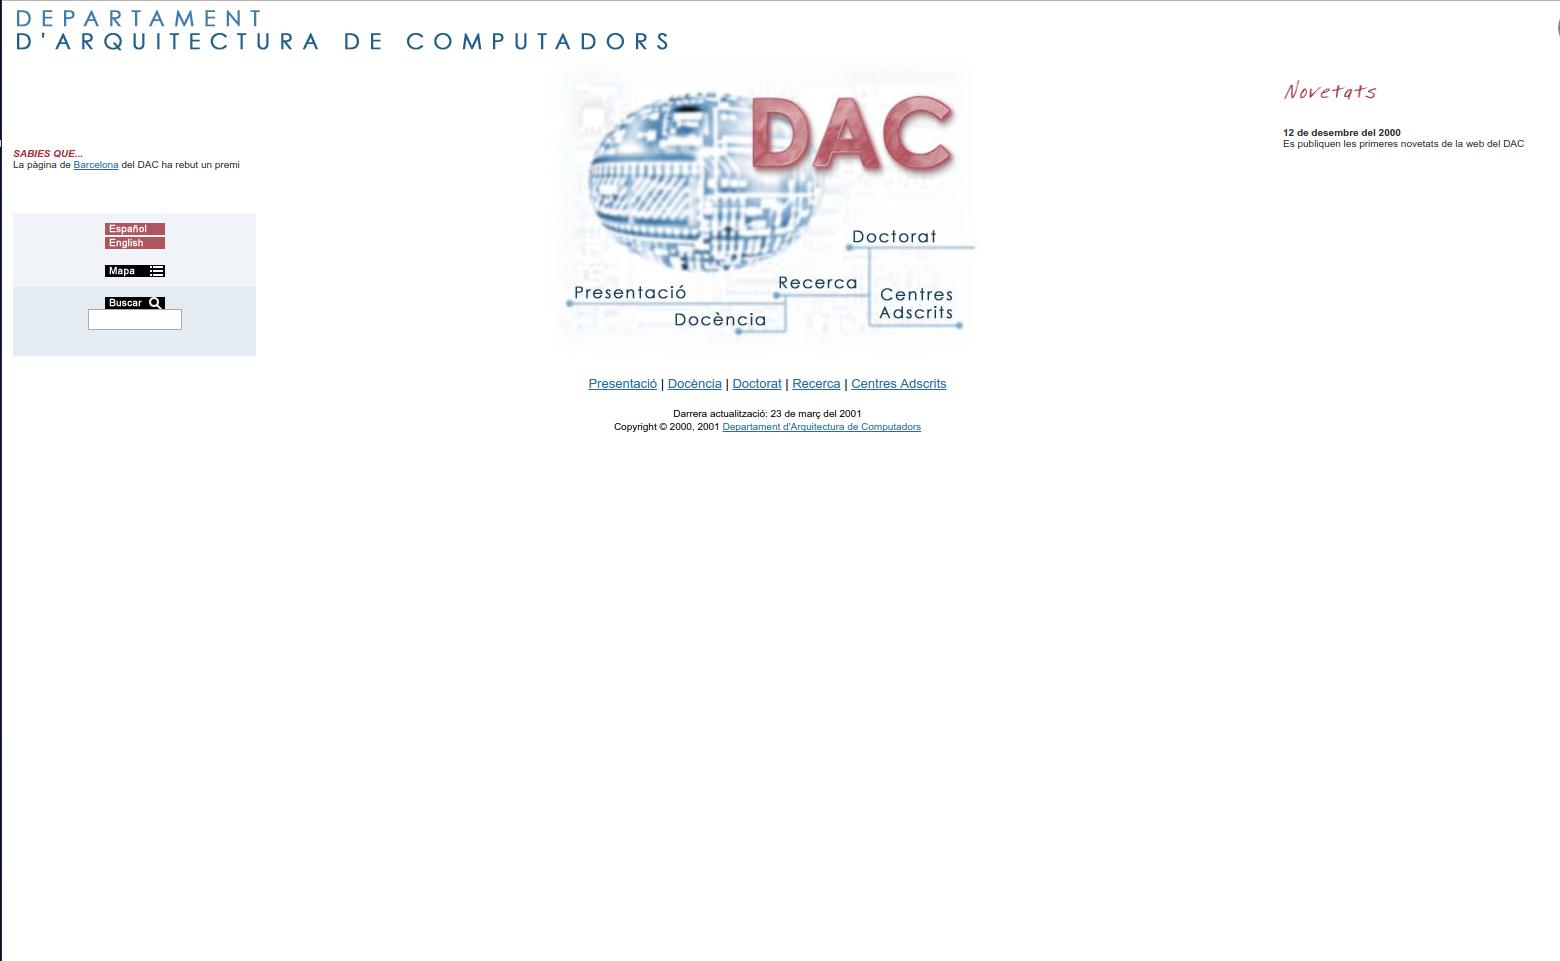 2001 web page